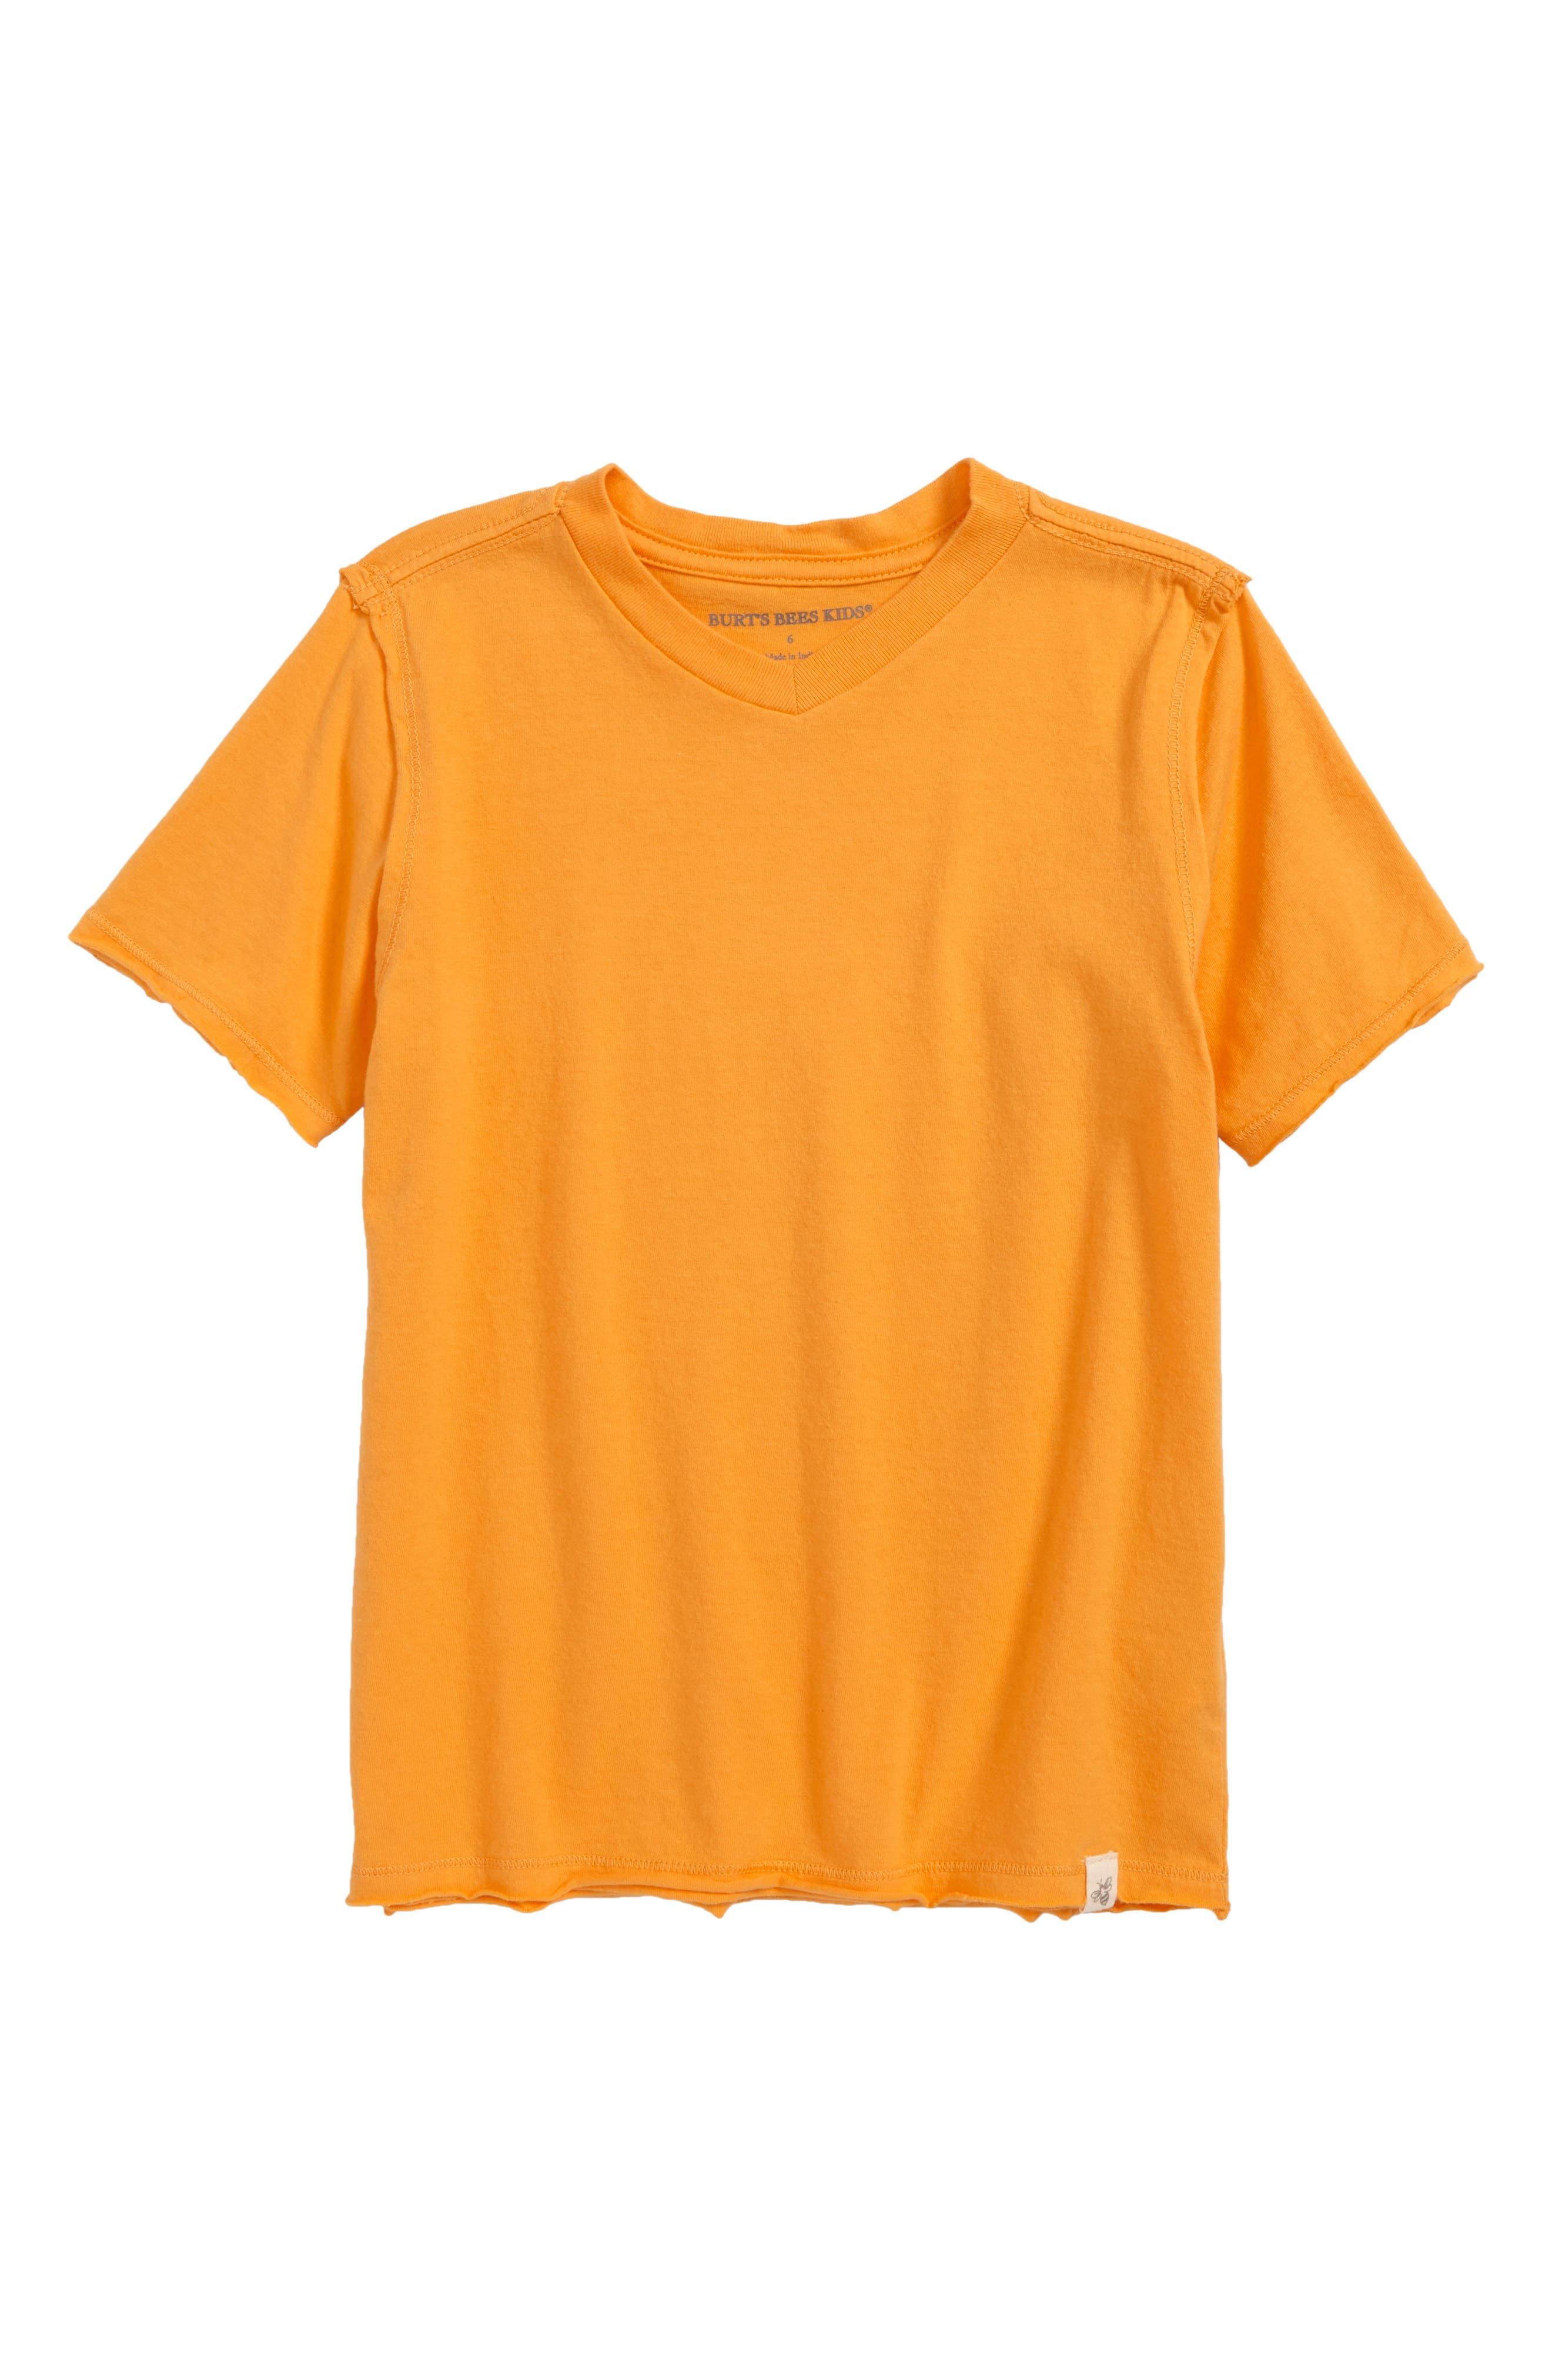 Main Image - Burt's Bees Baby V-Neck Organic Cotton T-Shirt (Toddler Boys & Little Boys)